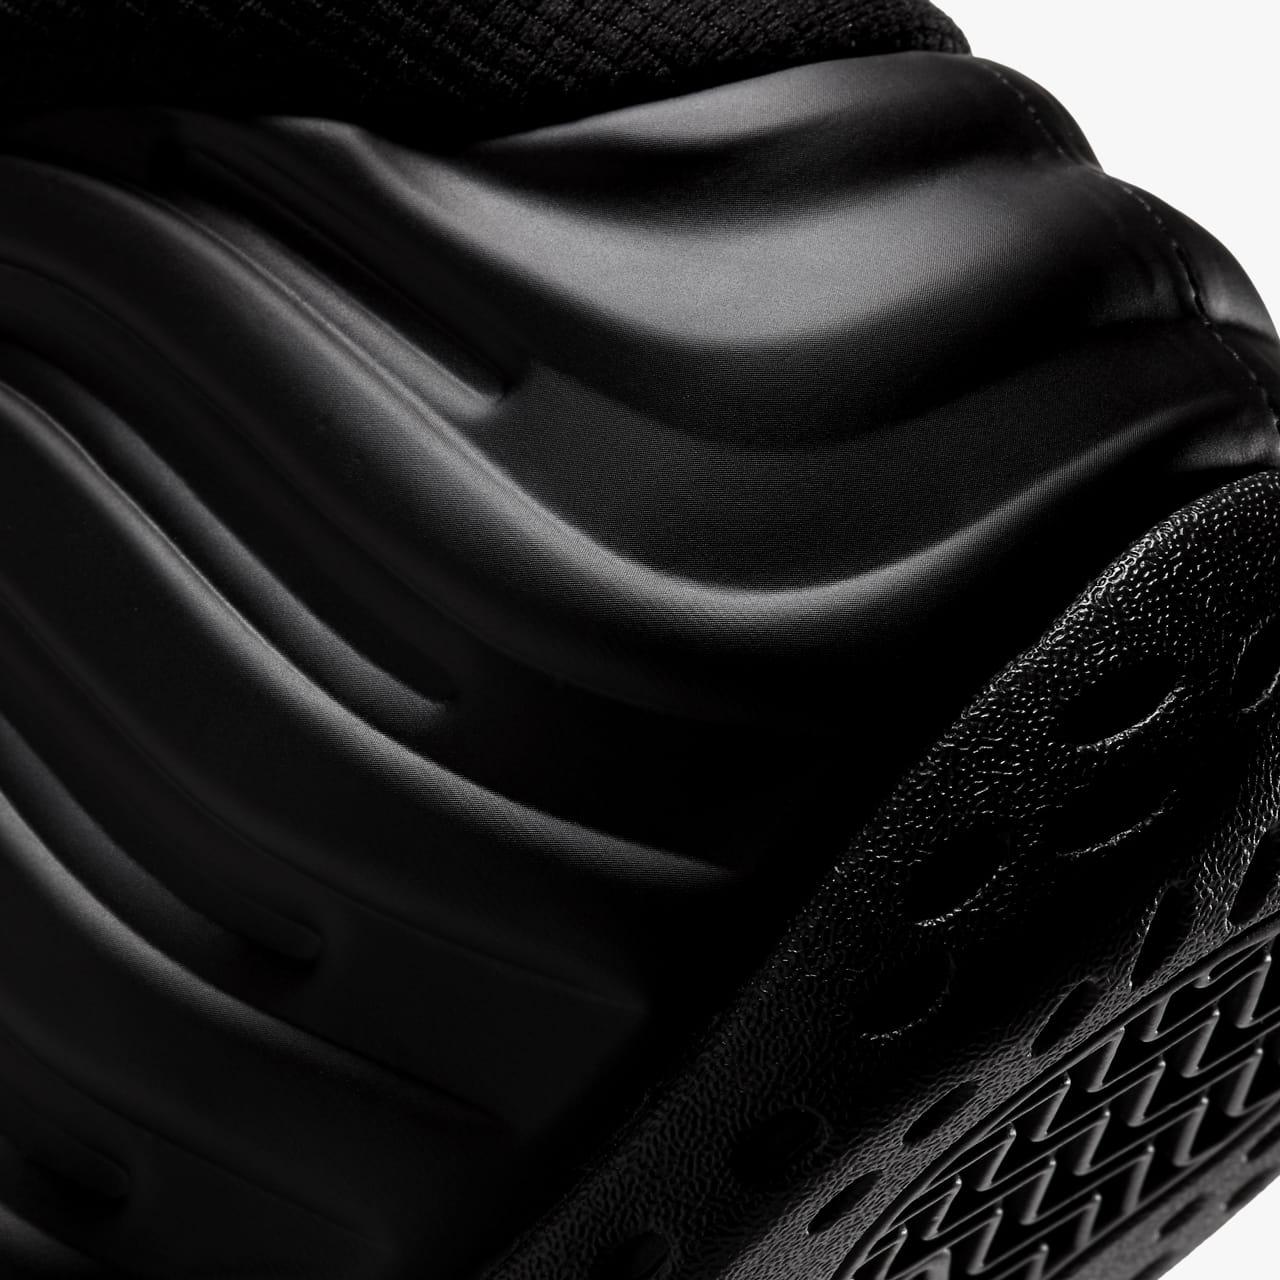 Nike Air Foamposite One Snakeskin Albino ...KicksOnFire